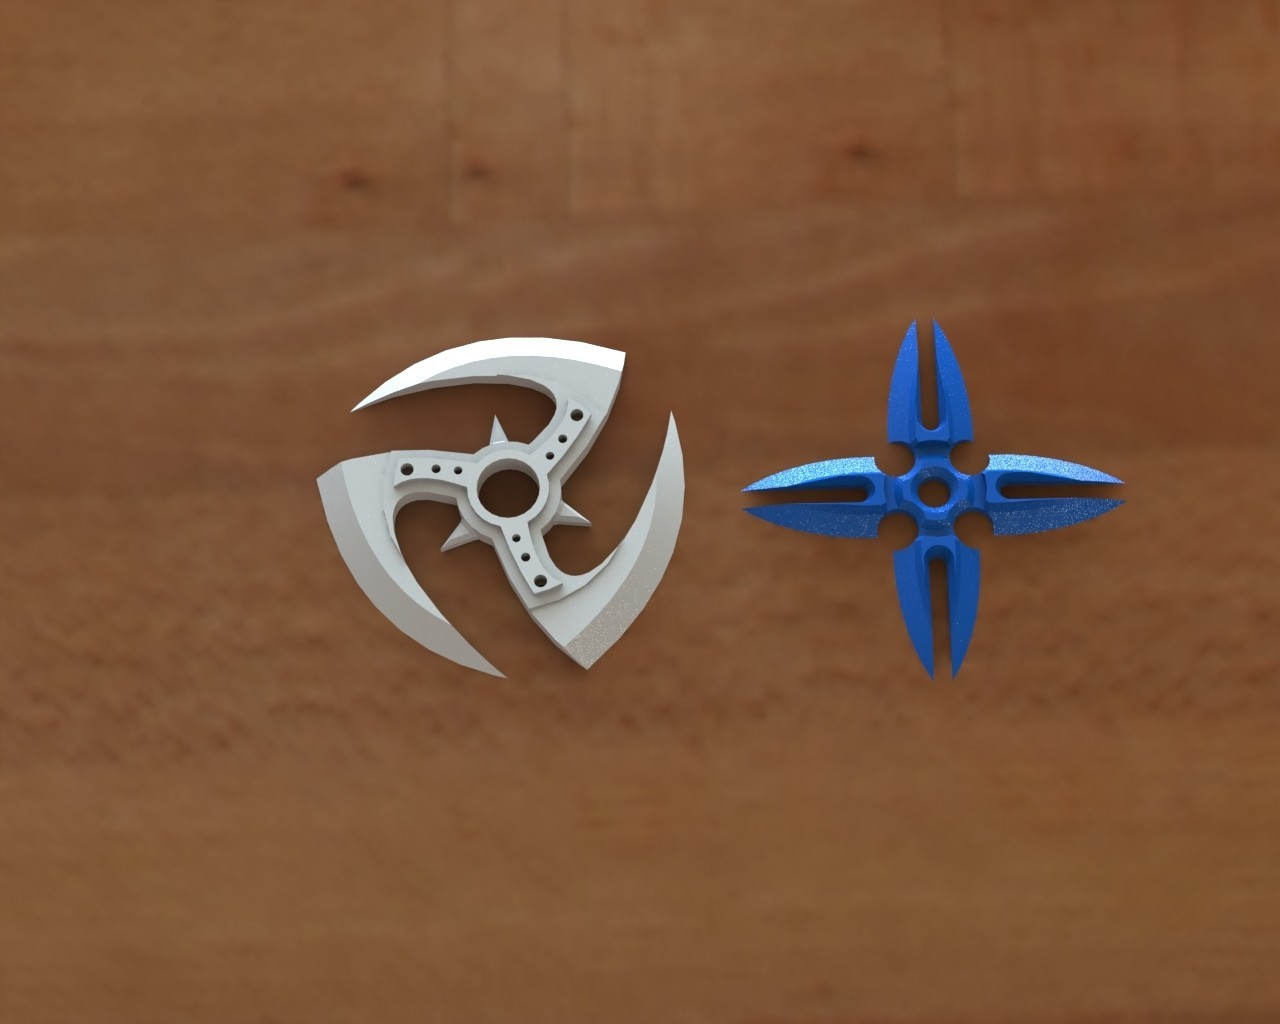 Ninja star 2.JPG Download STL file Ninja stars 2 • 3D printing design, Majs84